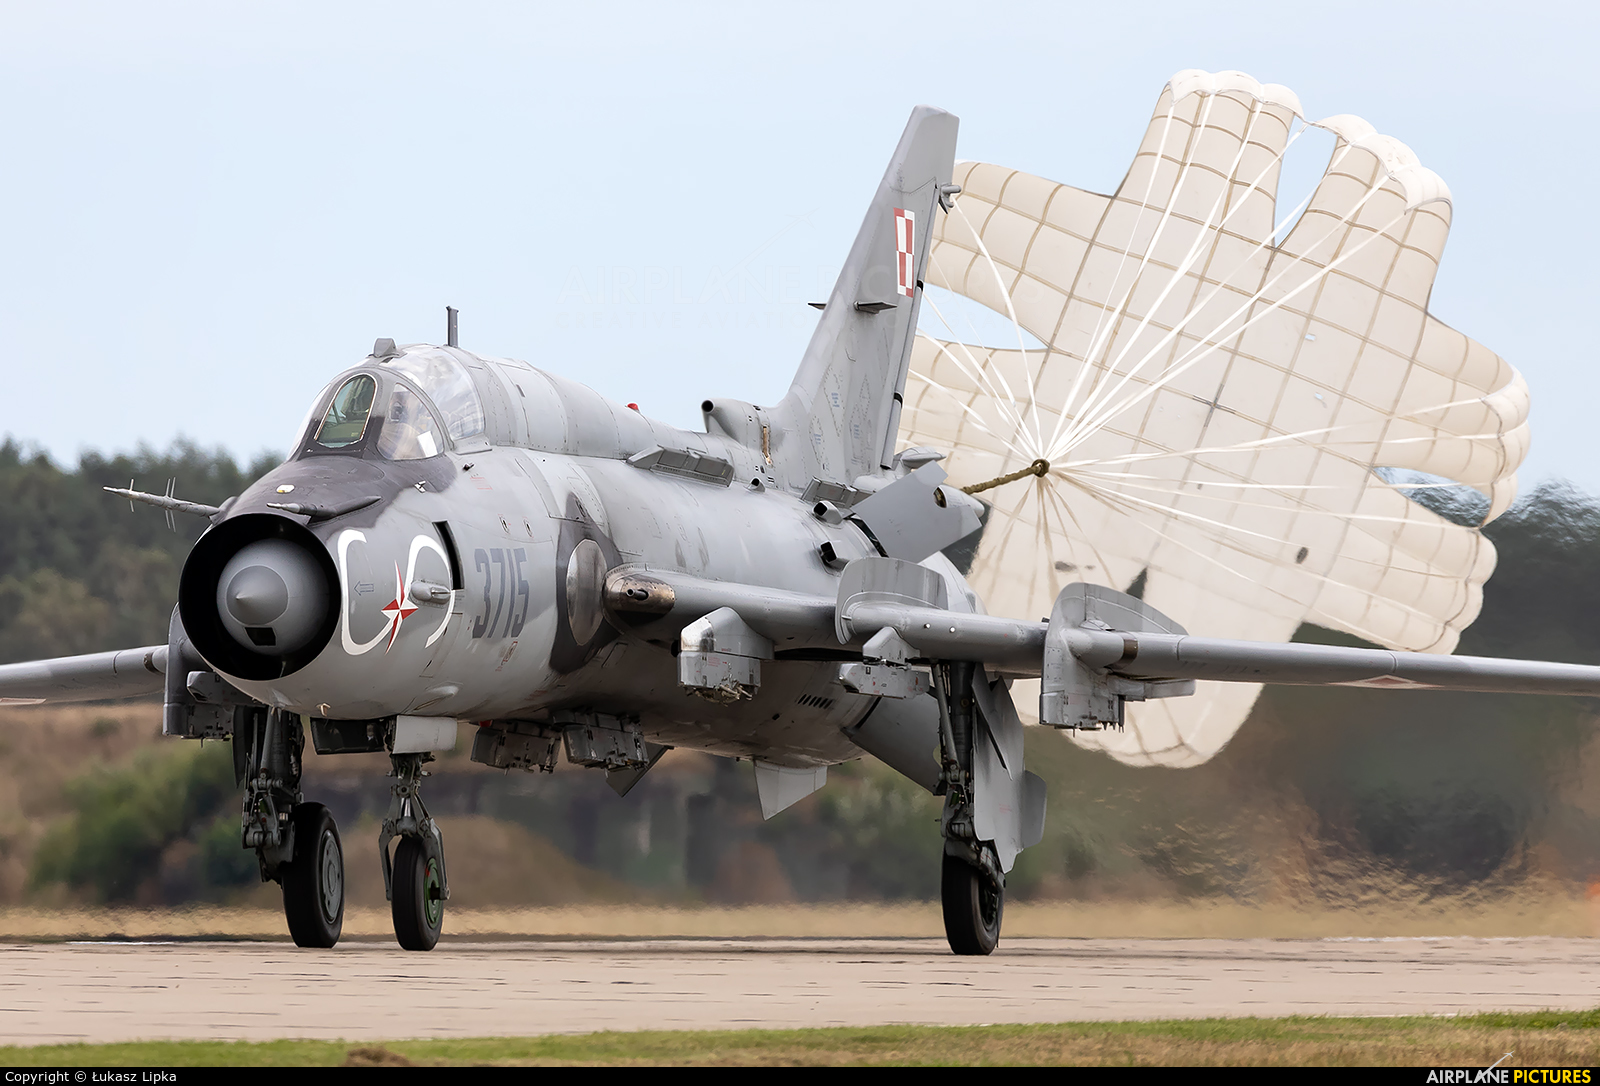 Poland - Air Force 3715 aircraft at Mirosławiec